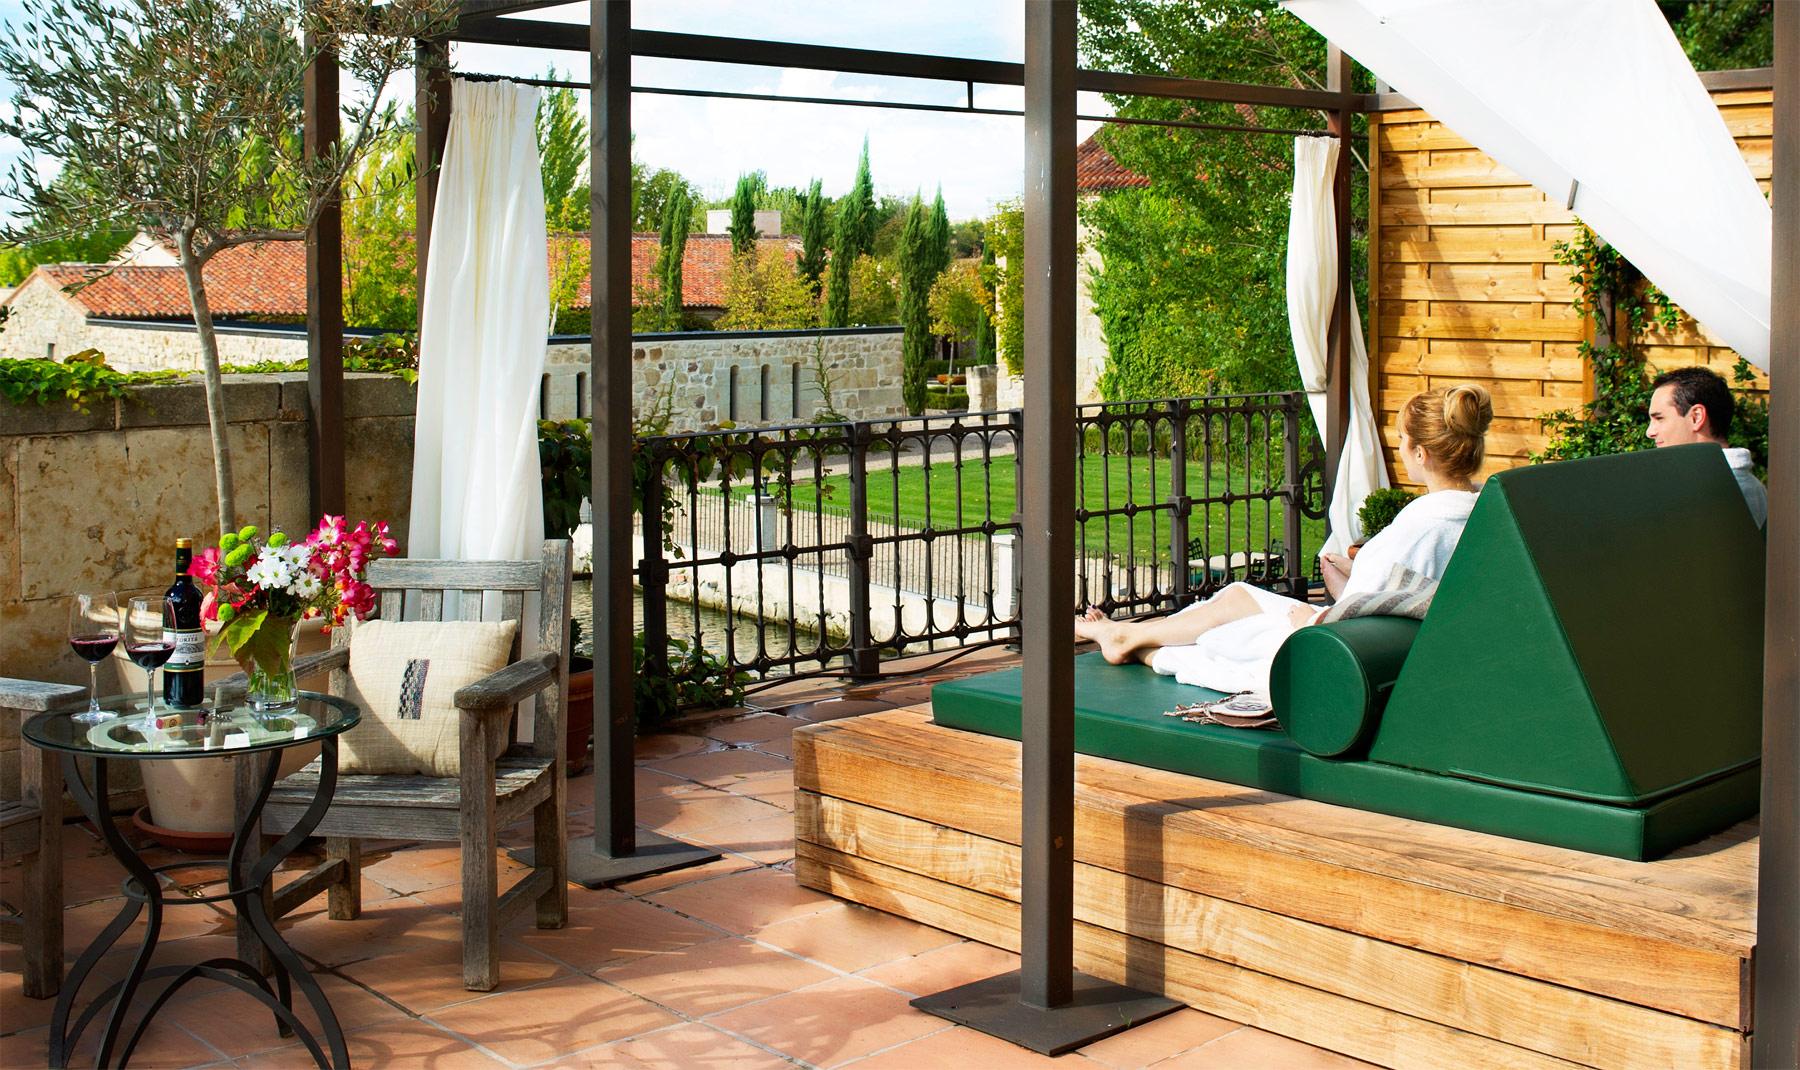 Understated Luxury At Hacienda Zorita Wine Hotel And Spa